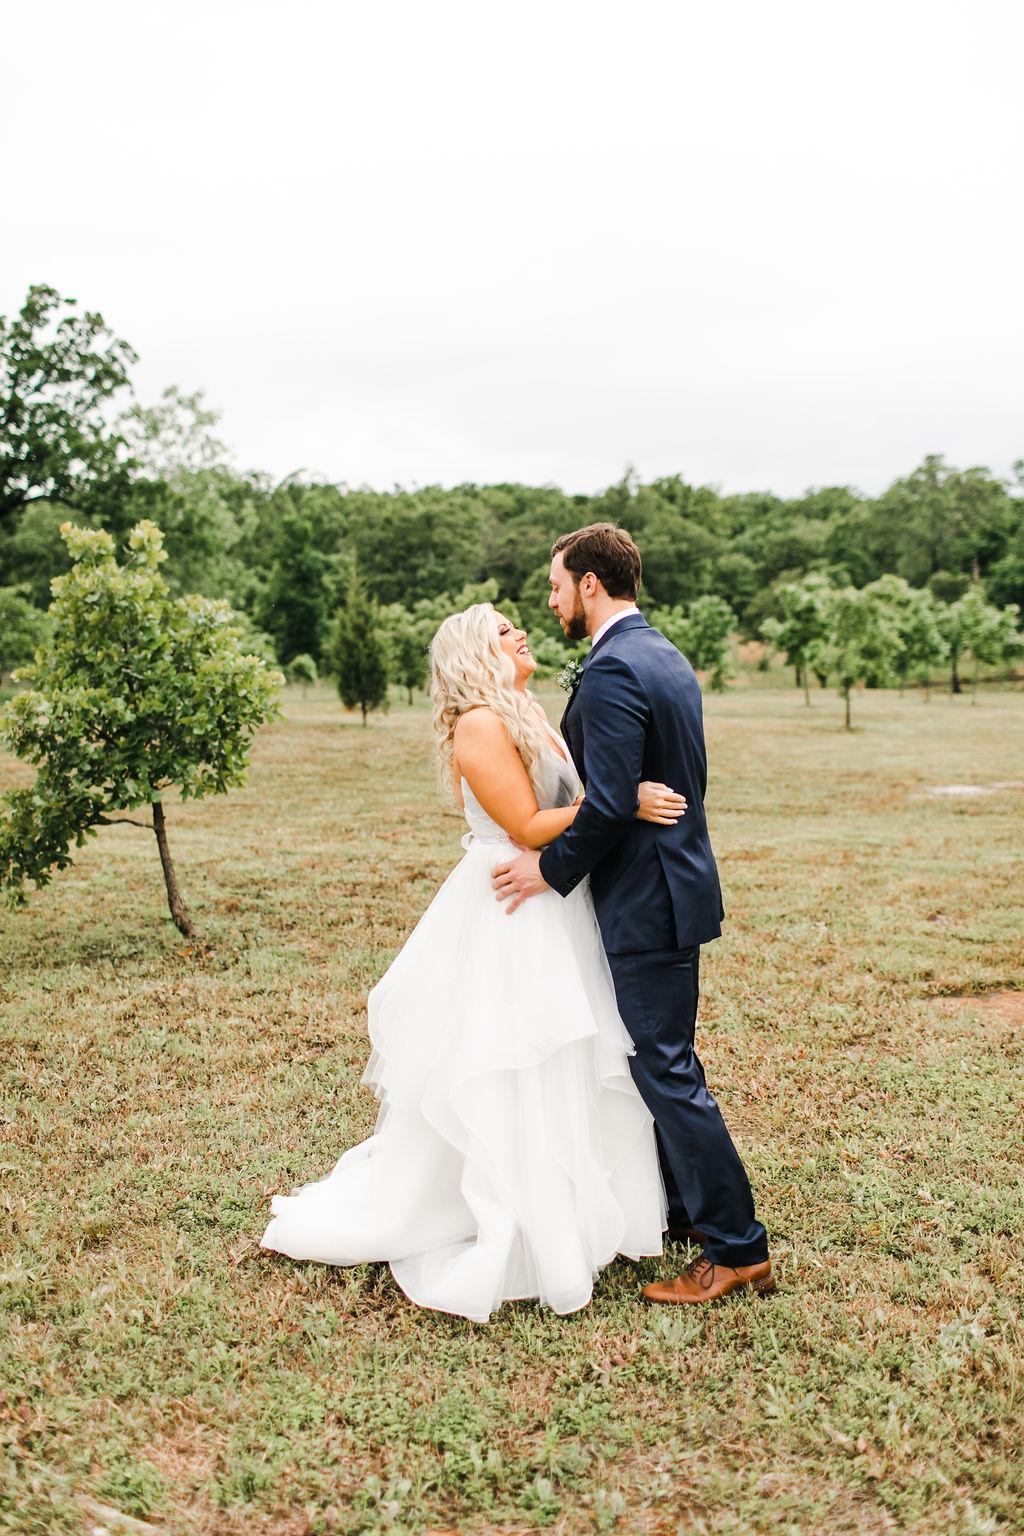 Dream Point Ranch Tulsa's White Barn Wedding Venue 42.jpg